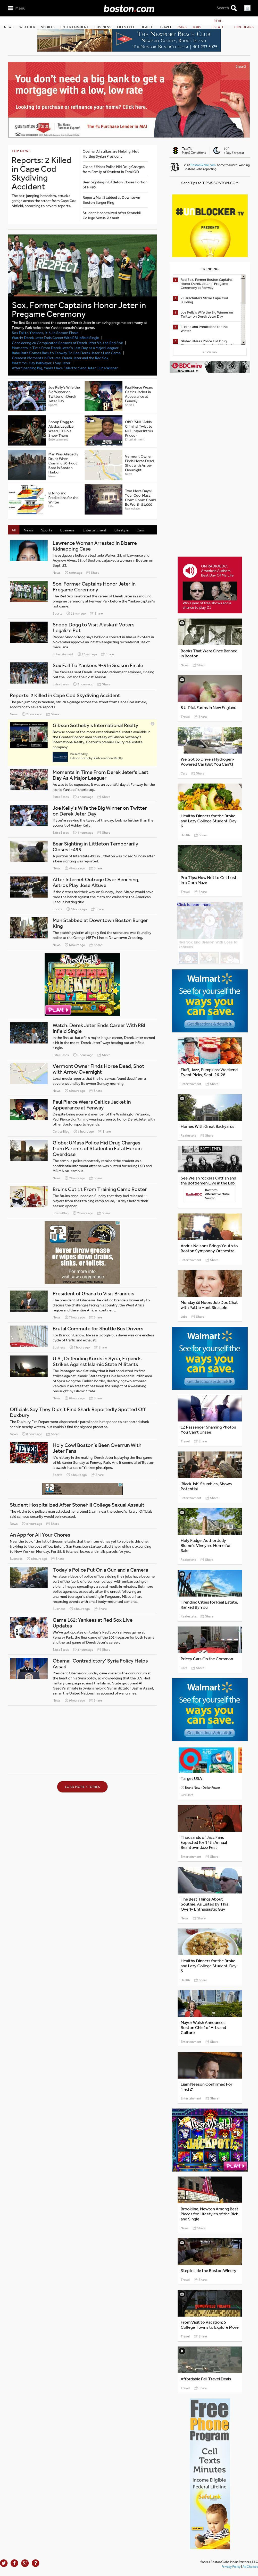 Boston.com at Monday Sept. 29, 2014, 1:01 a.m. UTC